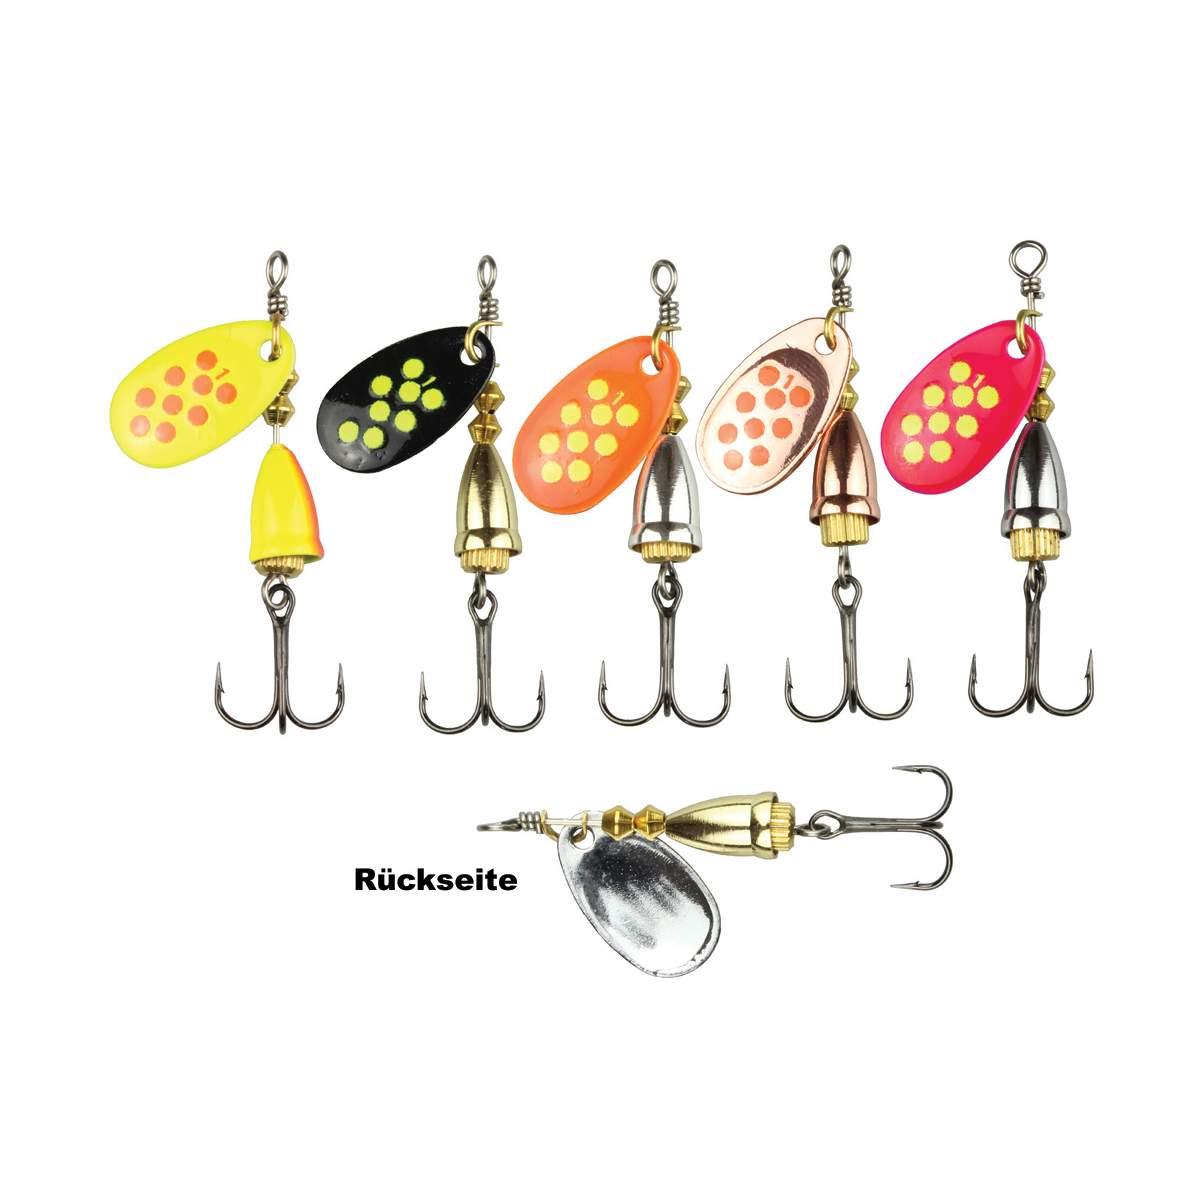 Mini Löffel Blinker 2,2 cm 1,4g Gummifische Jigs im Shop